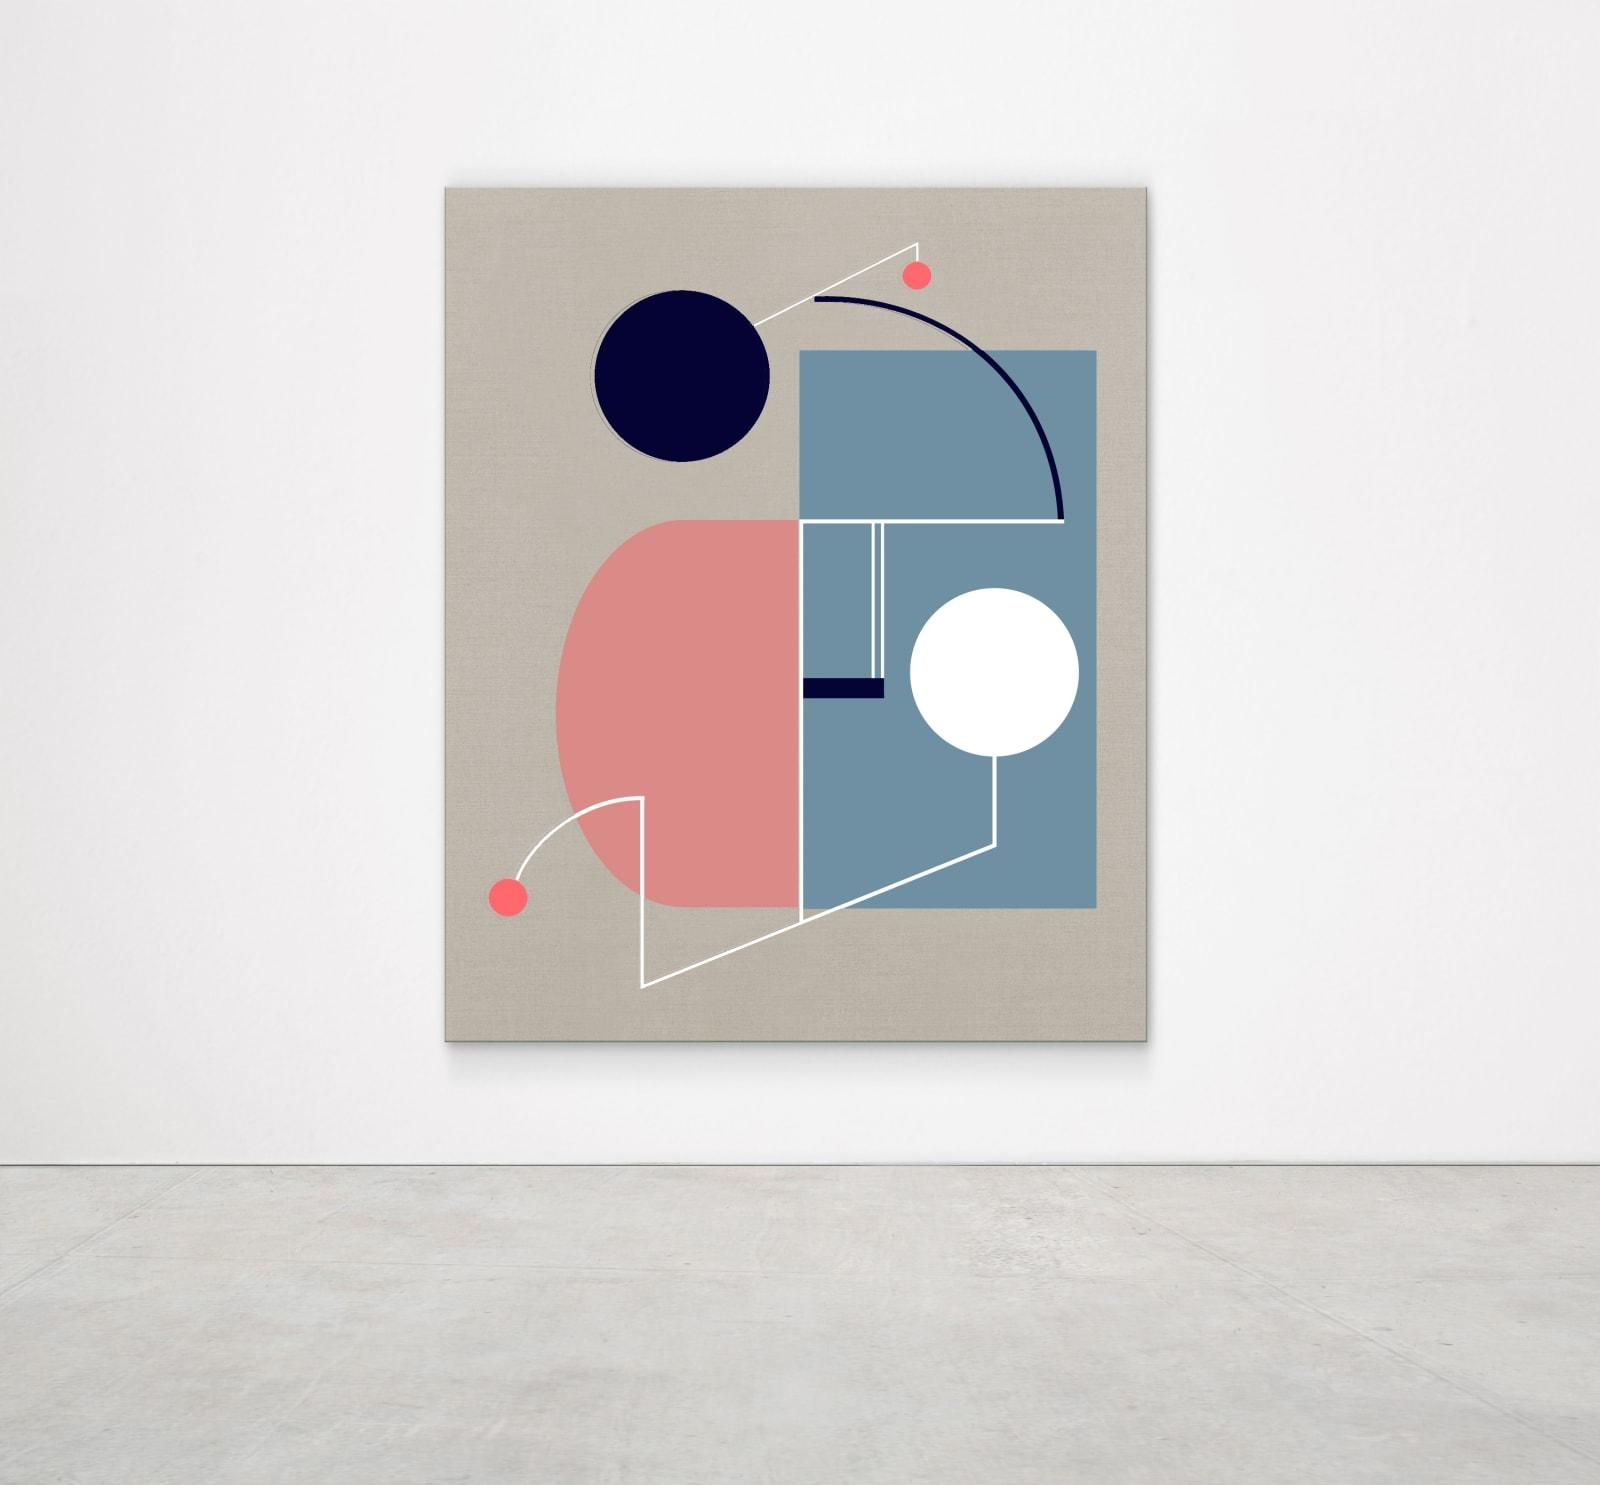 Sinta Tantra, A Dawn Kiss, 2019 Tempera on linen 160 x 130 cm